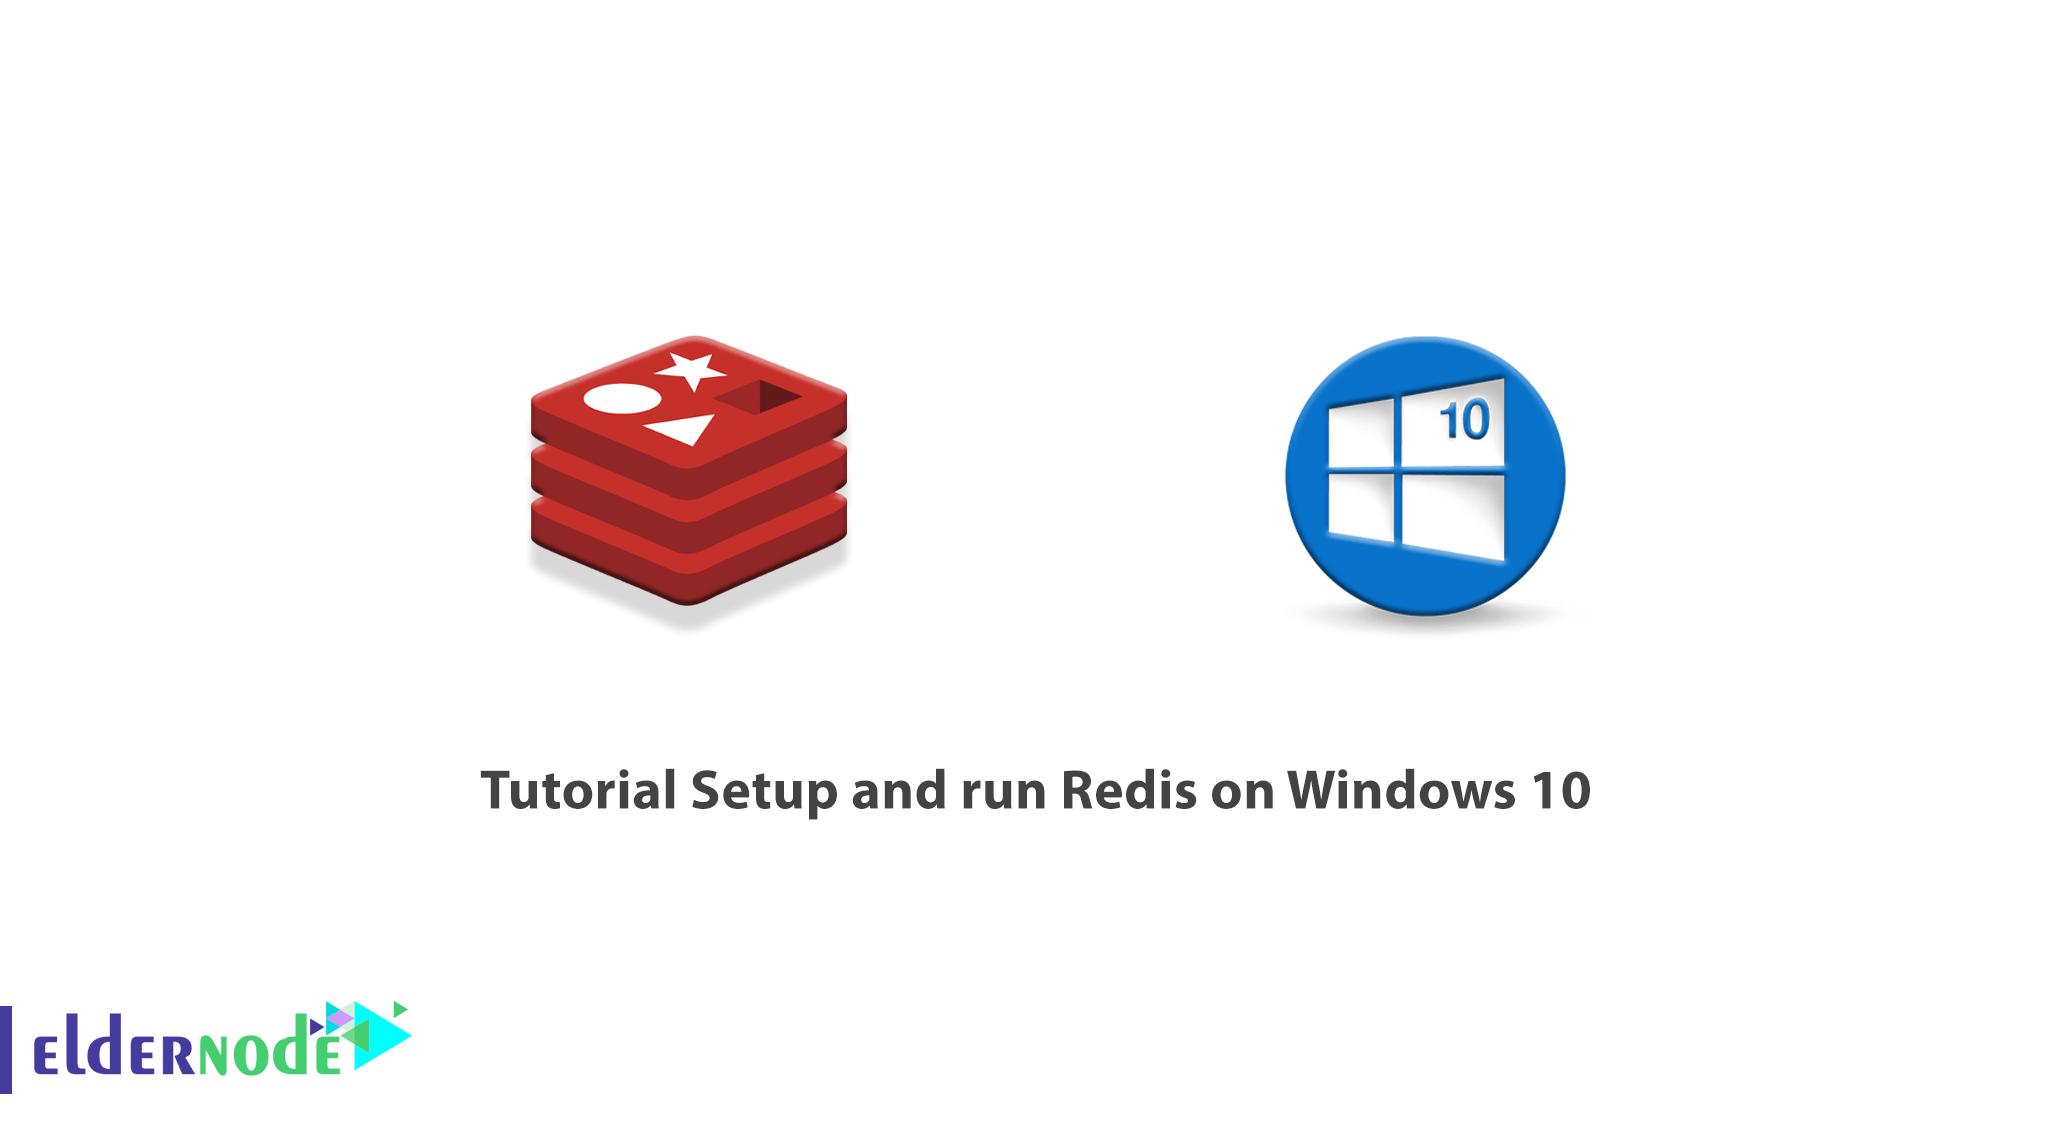 Tutorial Setup and run Redis on Windows 10